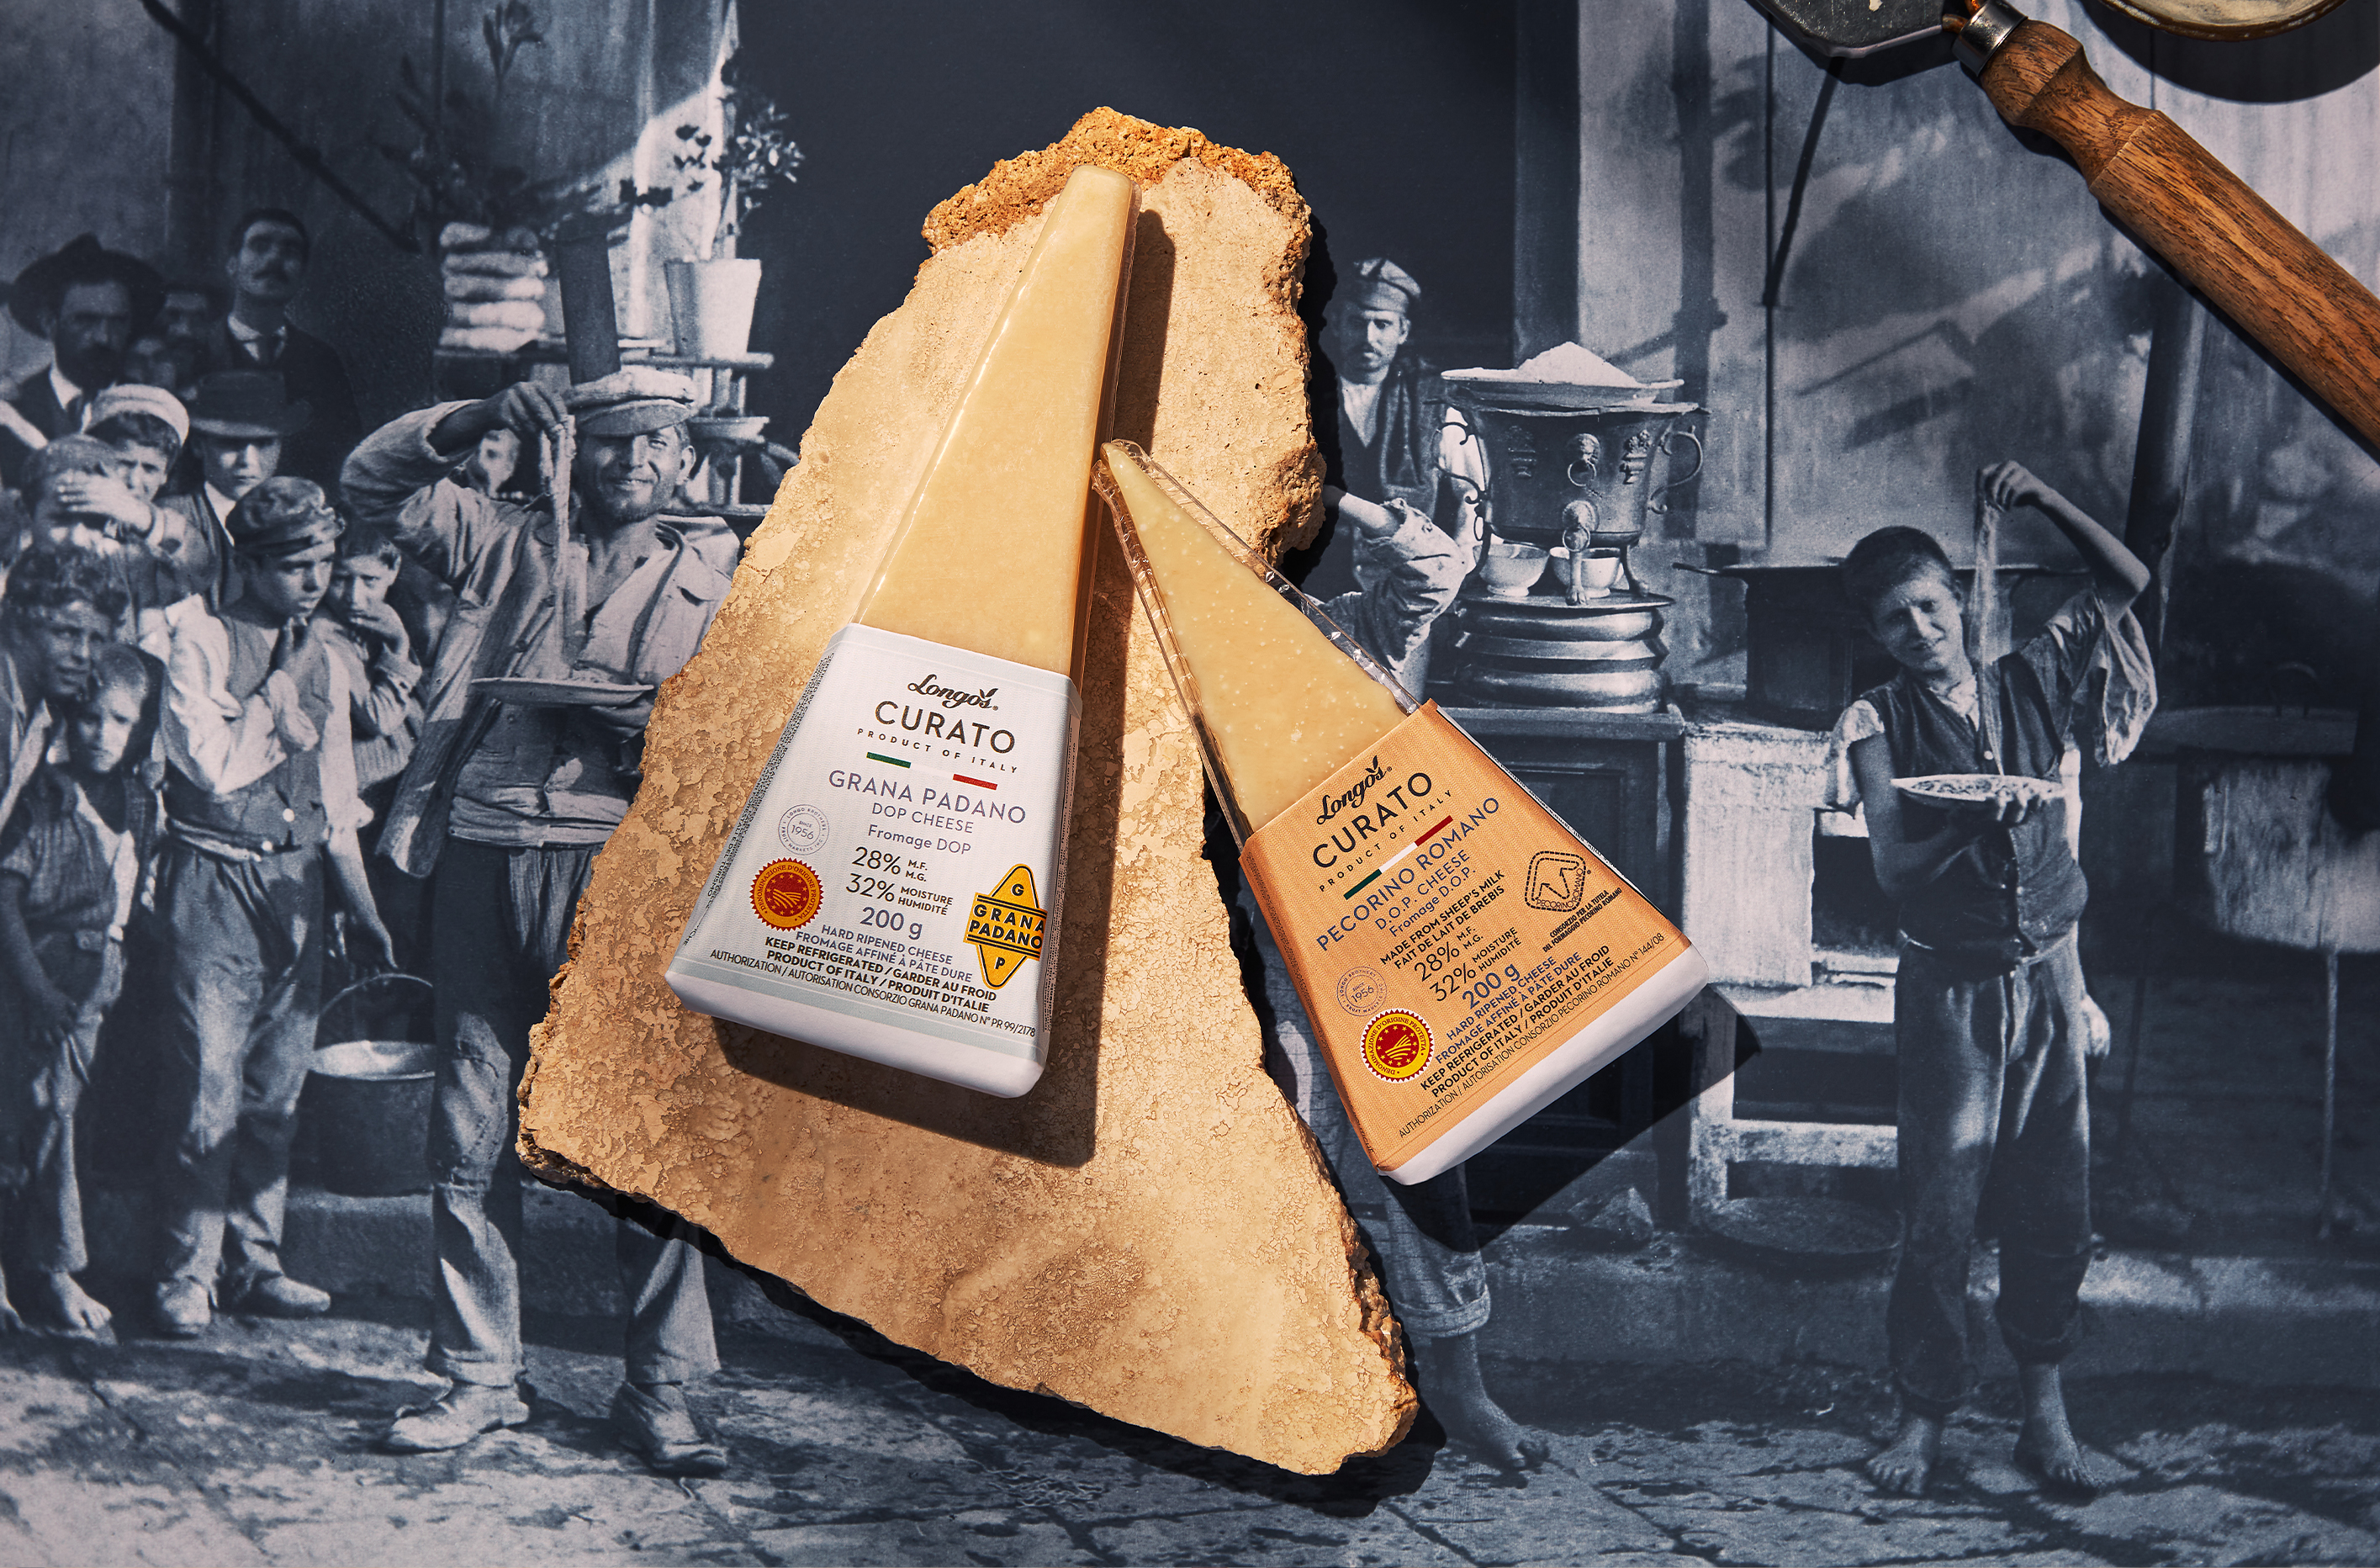 Longo's Curato Cheese